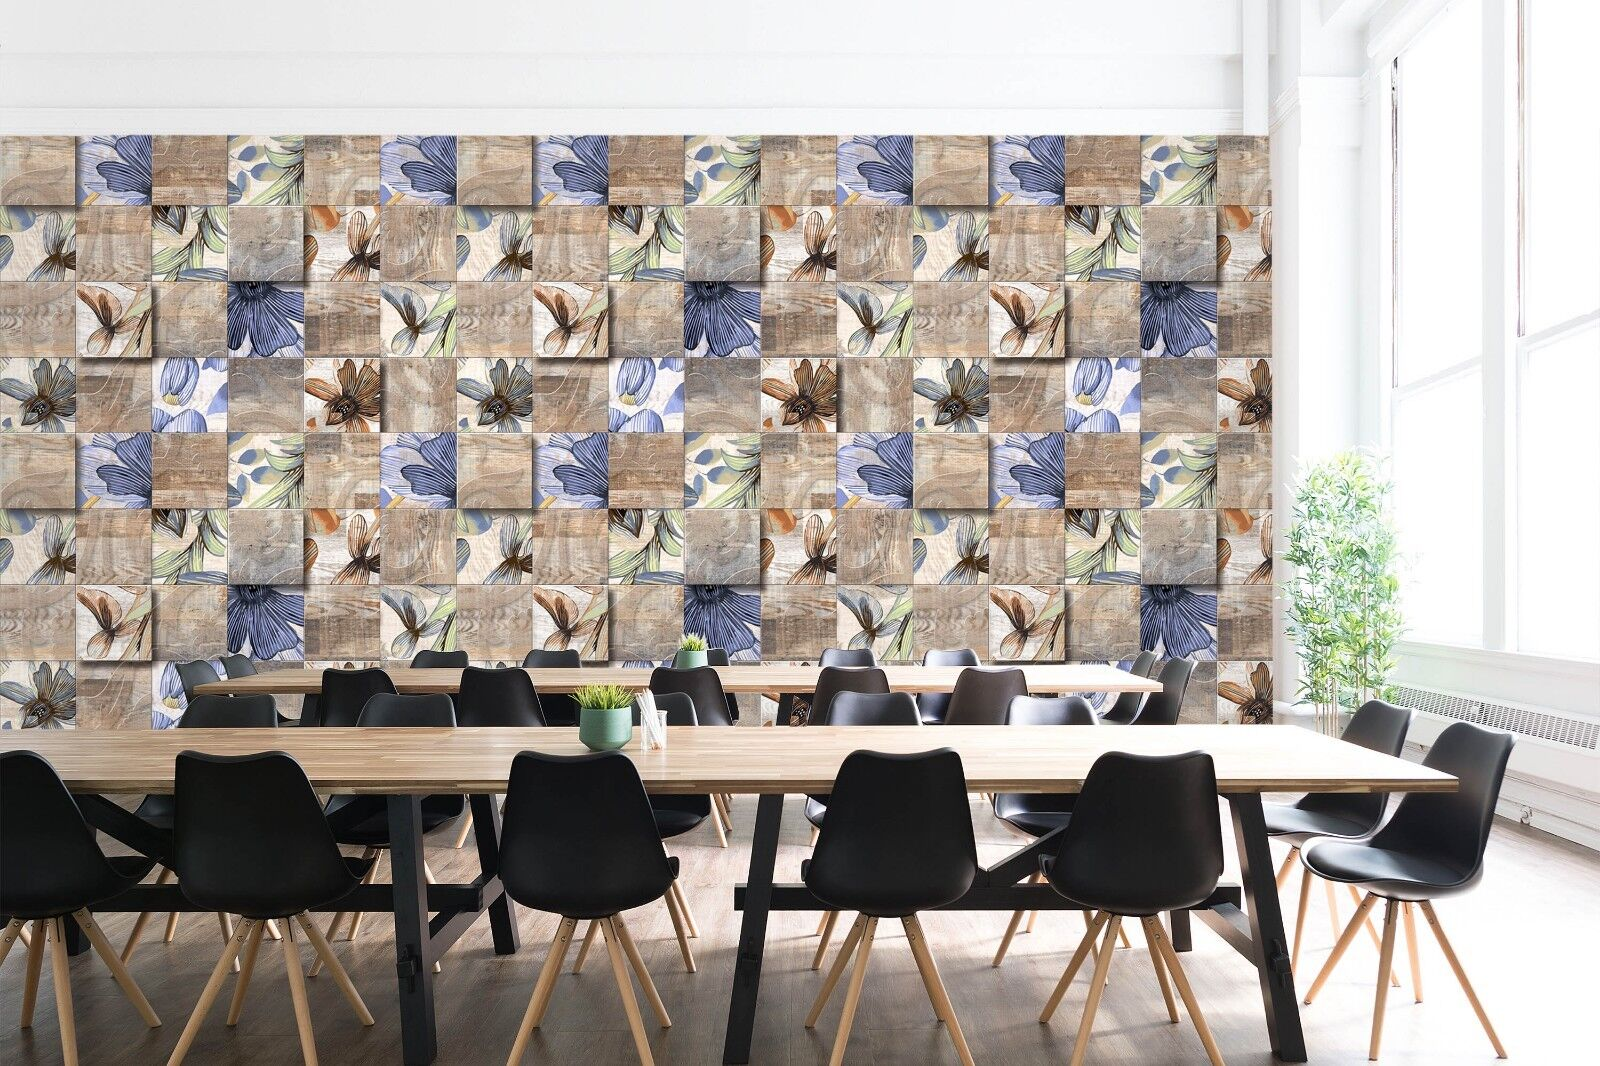 3D Blau Flower Pattern 871 Texture Tiles Marble Wall Paper Decal Wallpaper Mural